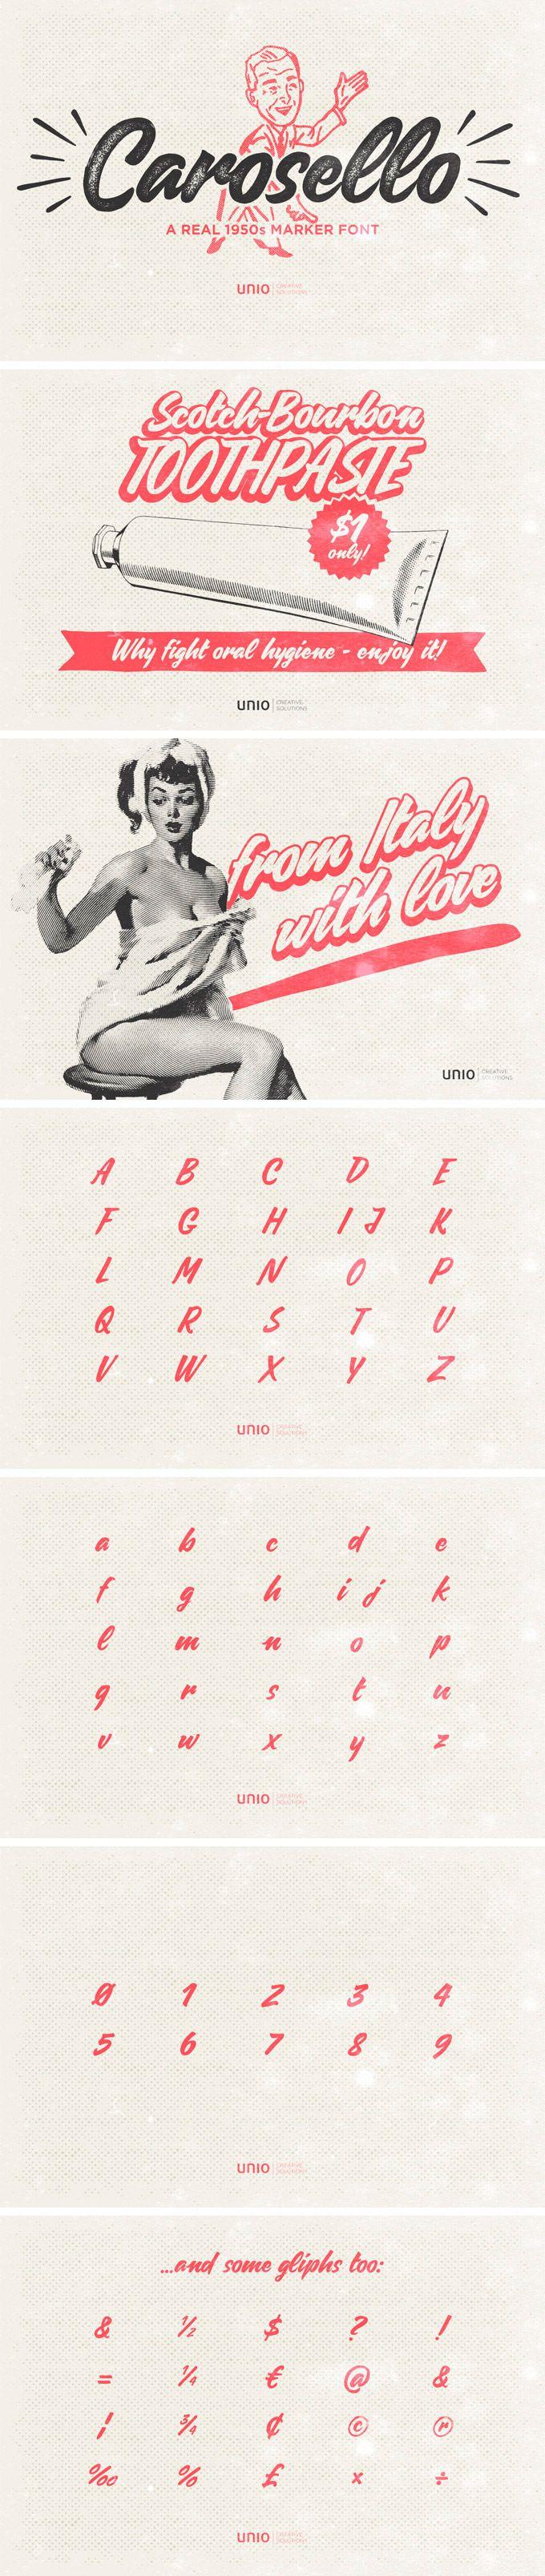 Carosello Font | Unio | Creative Solutions